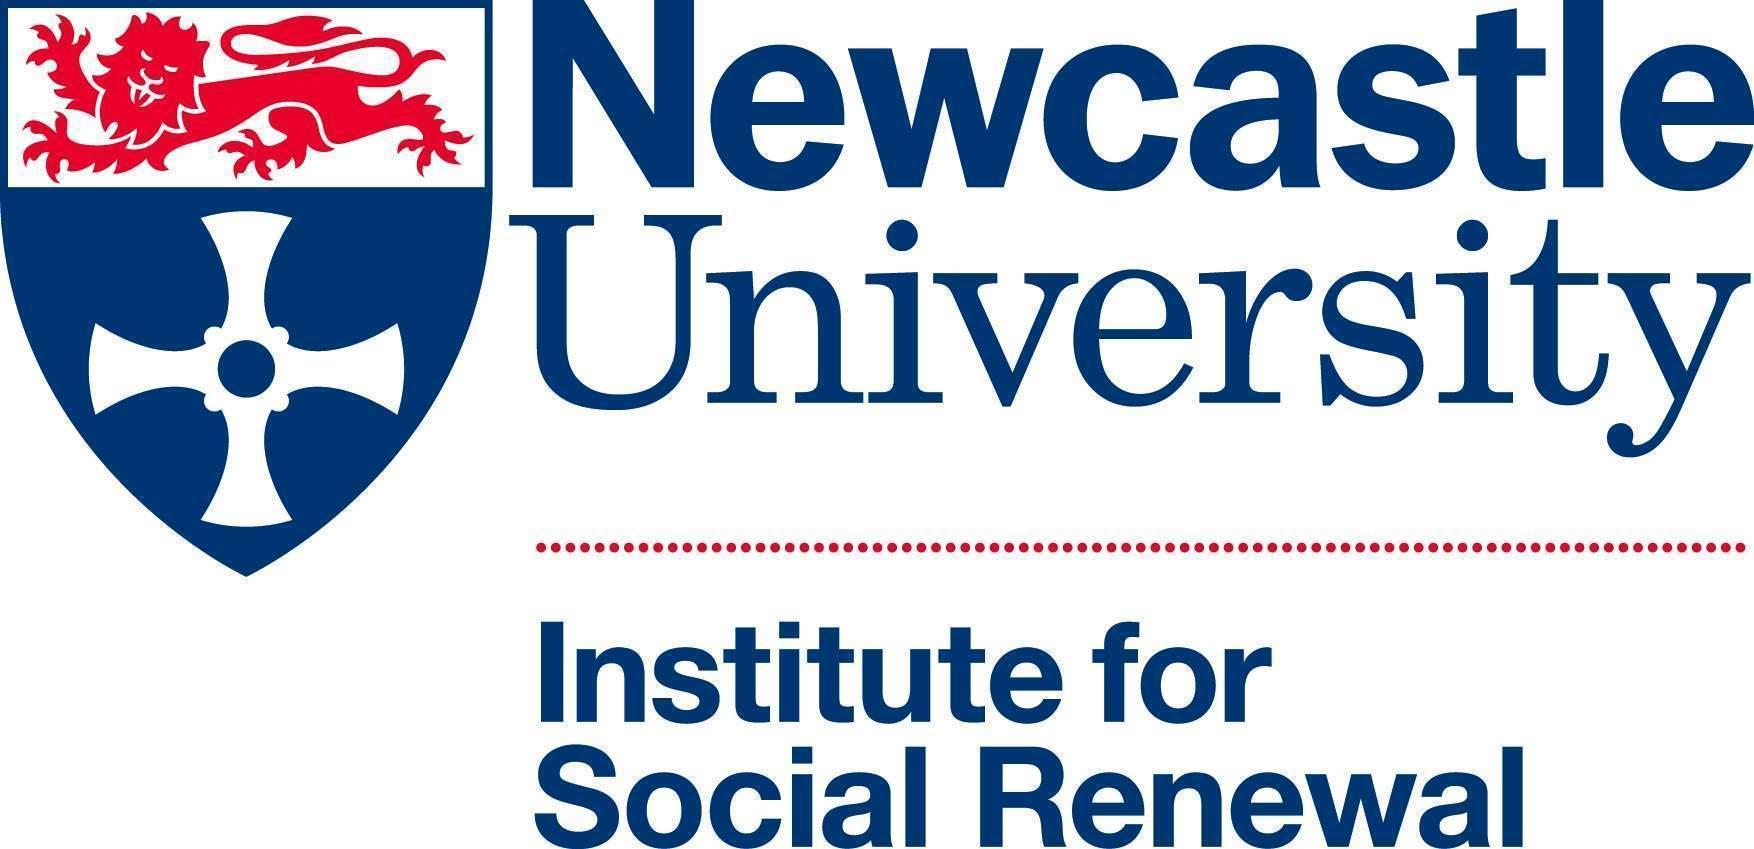 Newcastle University Institute for Social Renewal